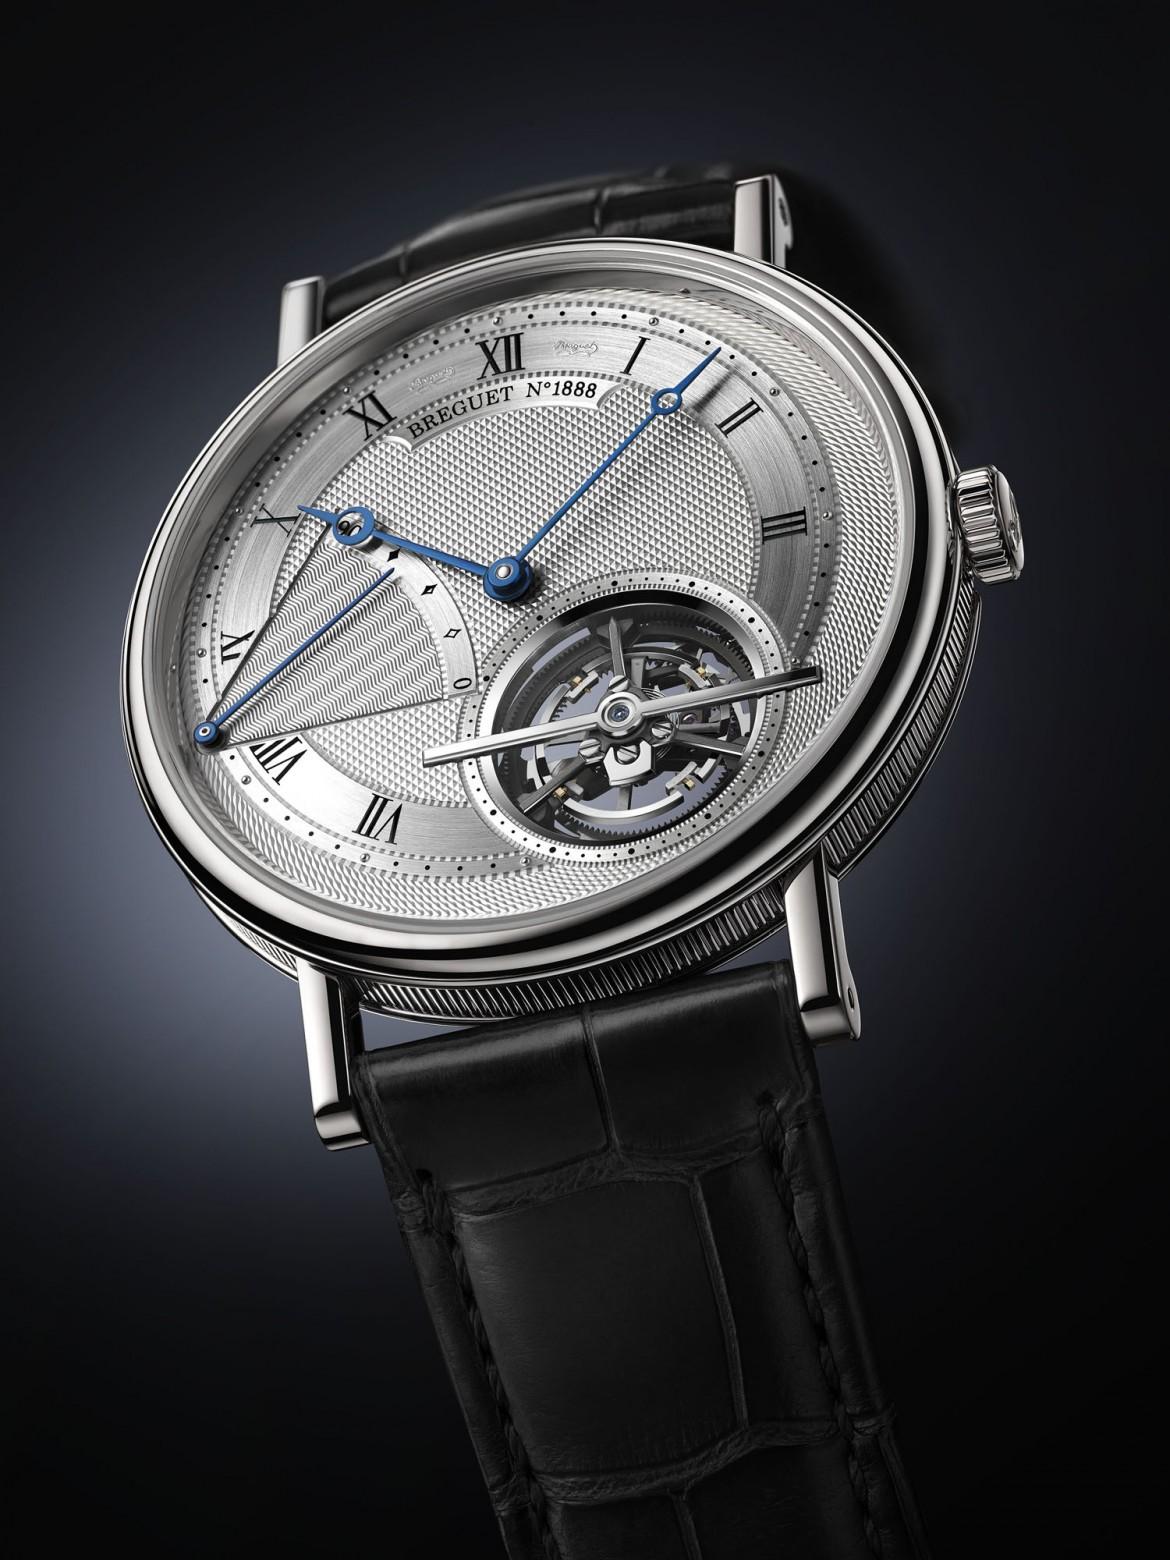 Breguet Classique Tourbillon replica watch